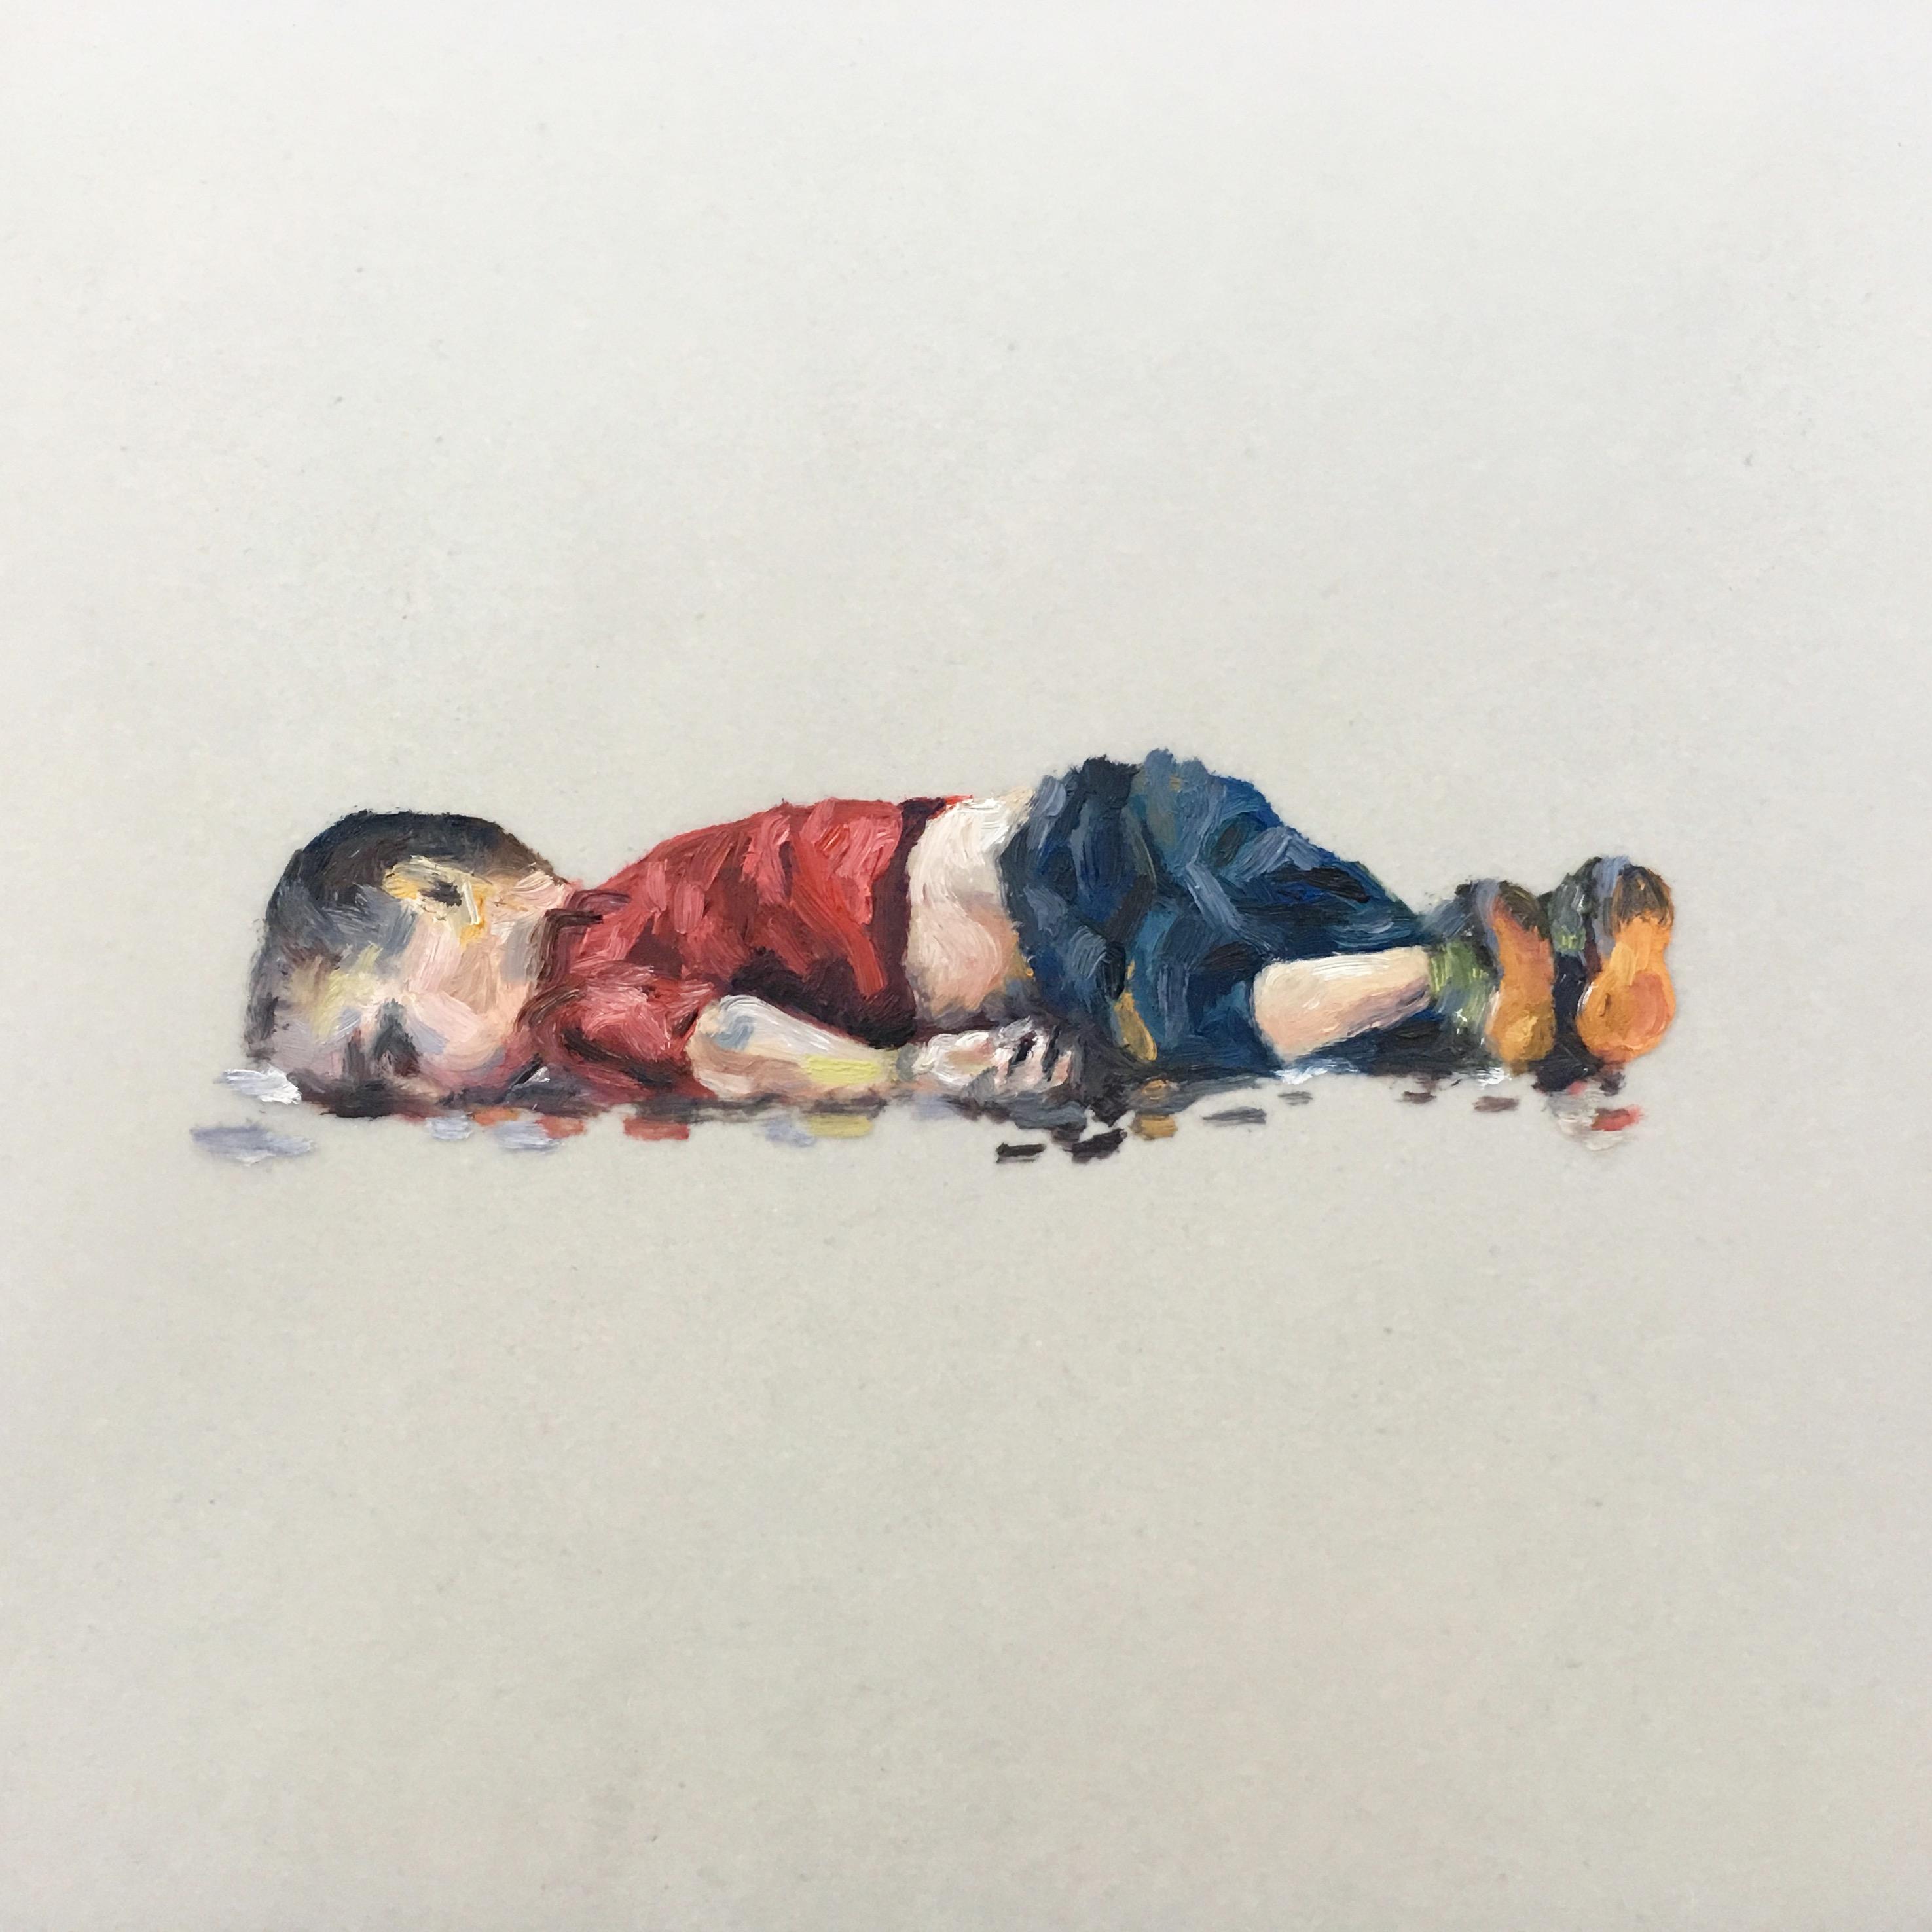 Forgotten Casualty: Alan Kurdi